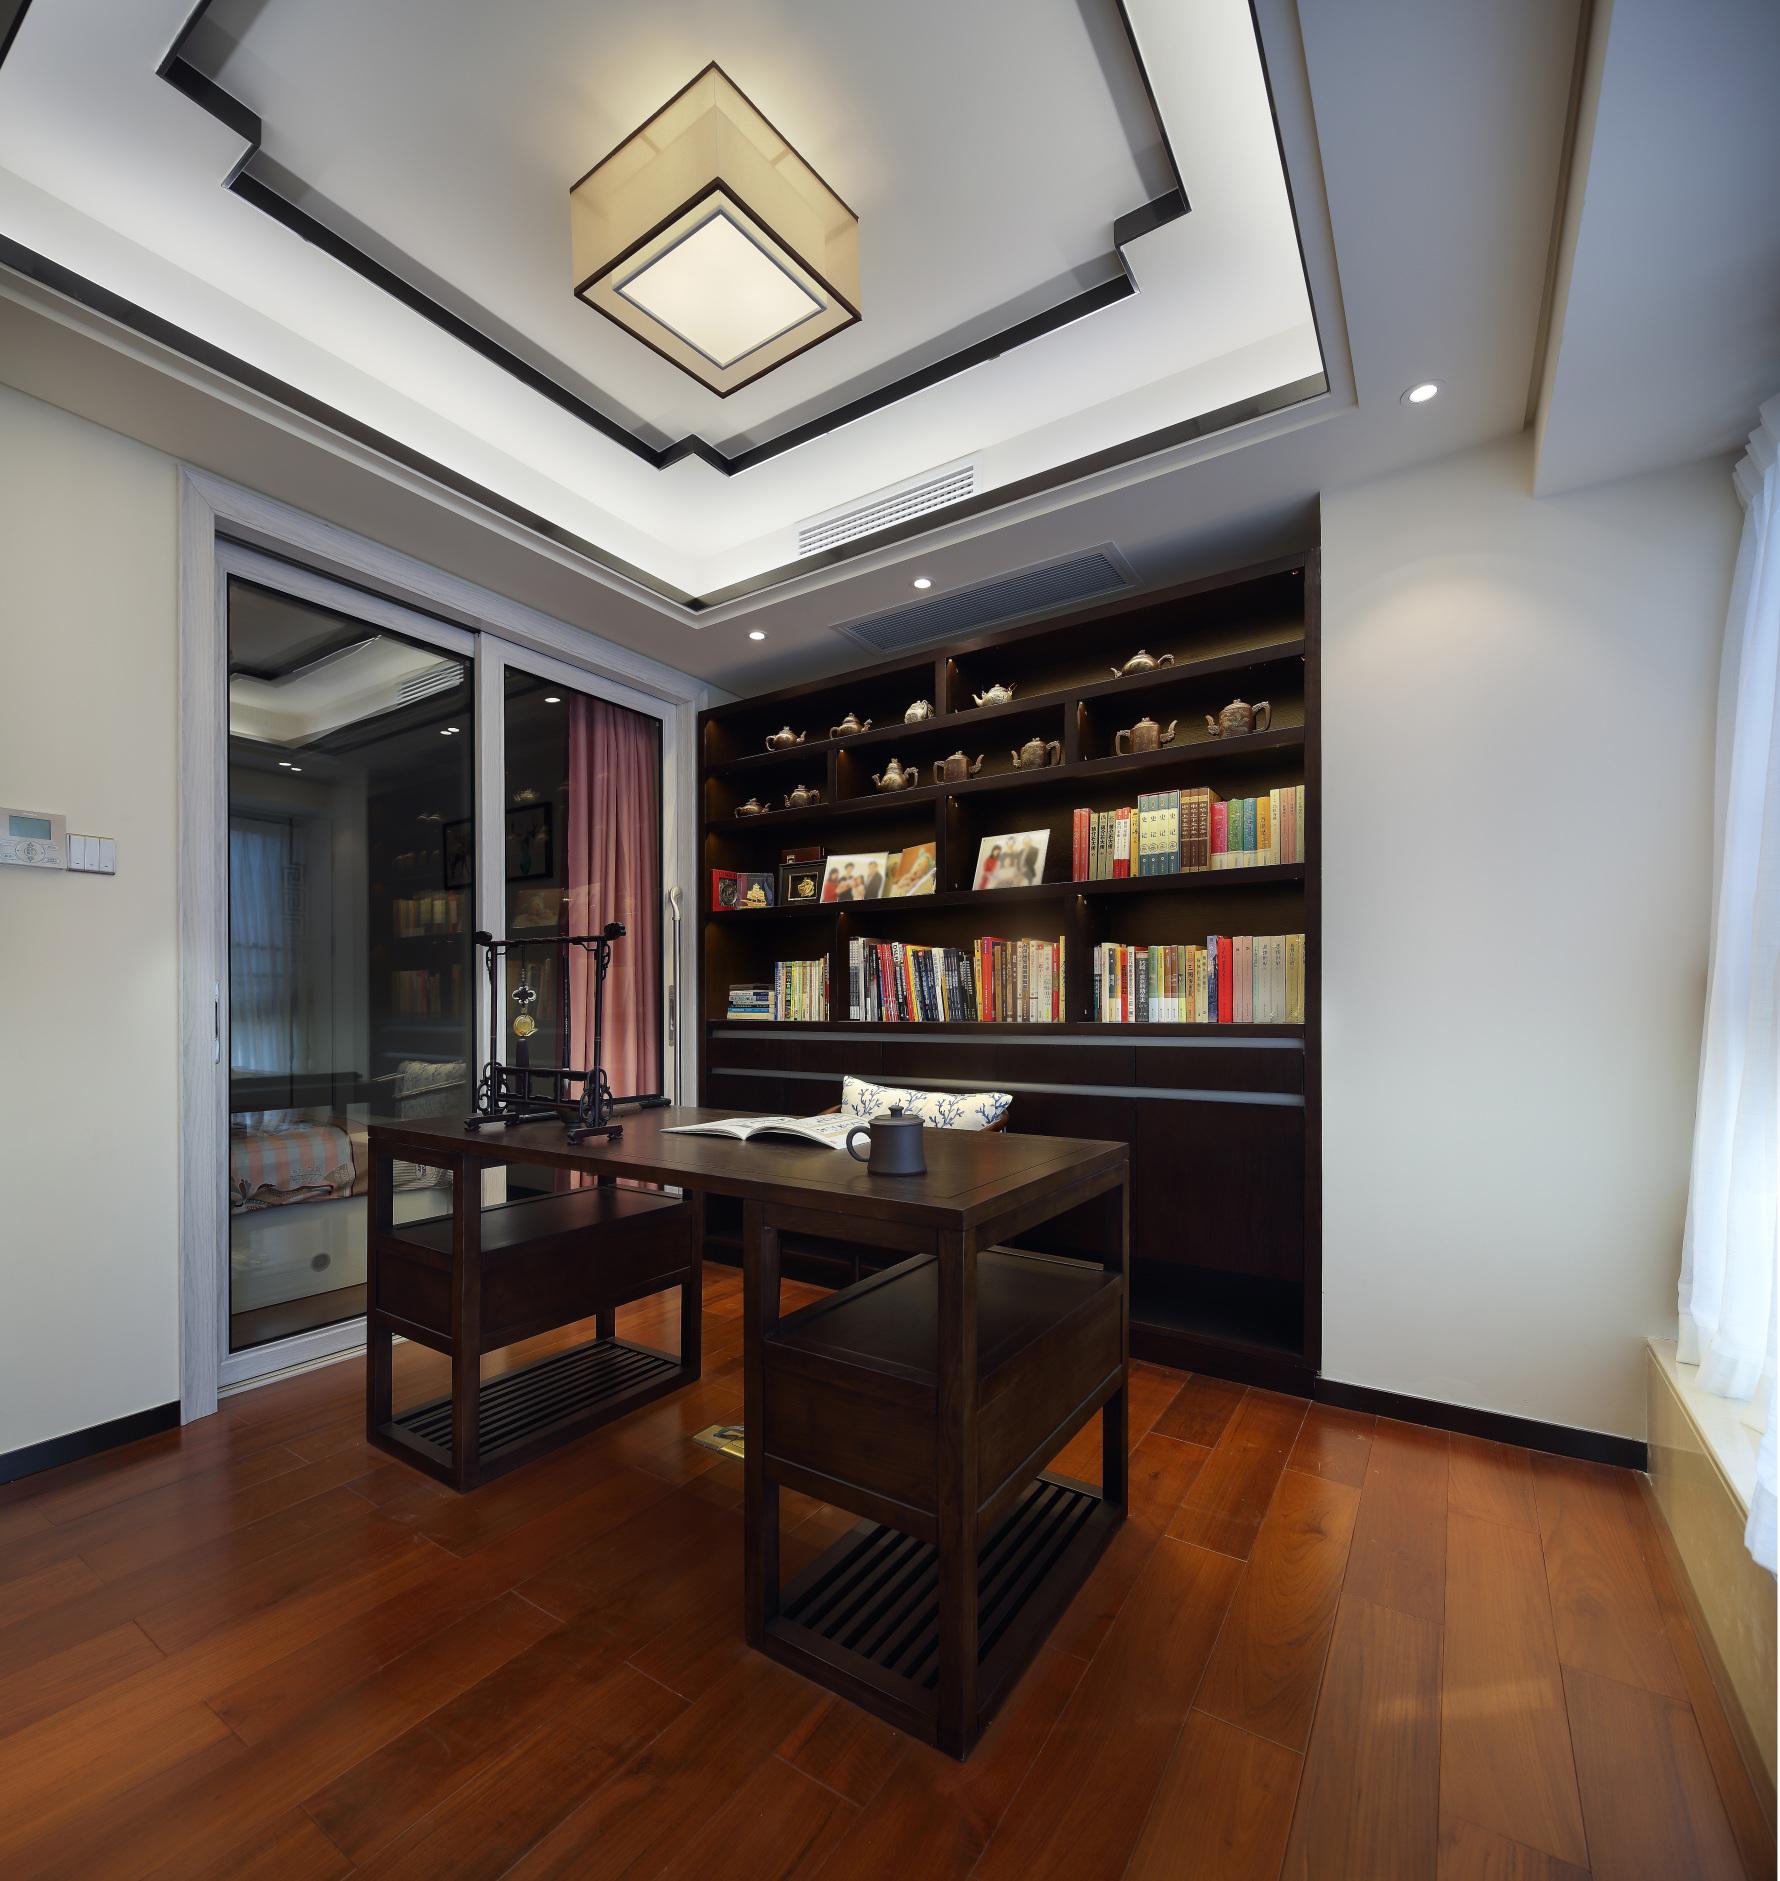 100m²中式风书房装修效果图